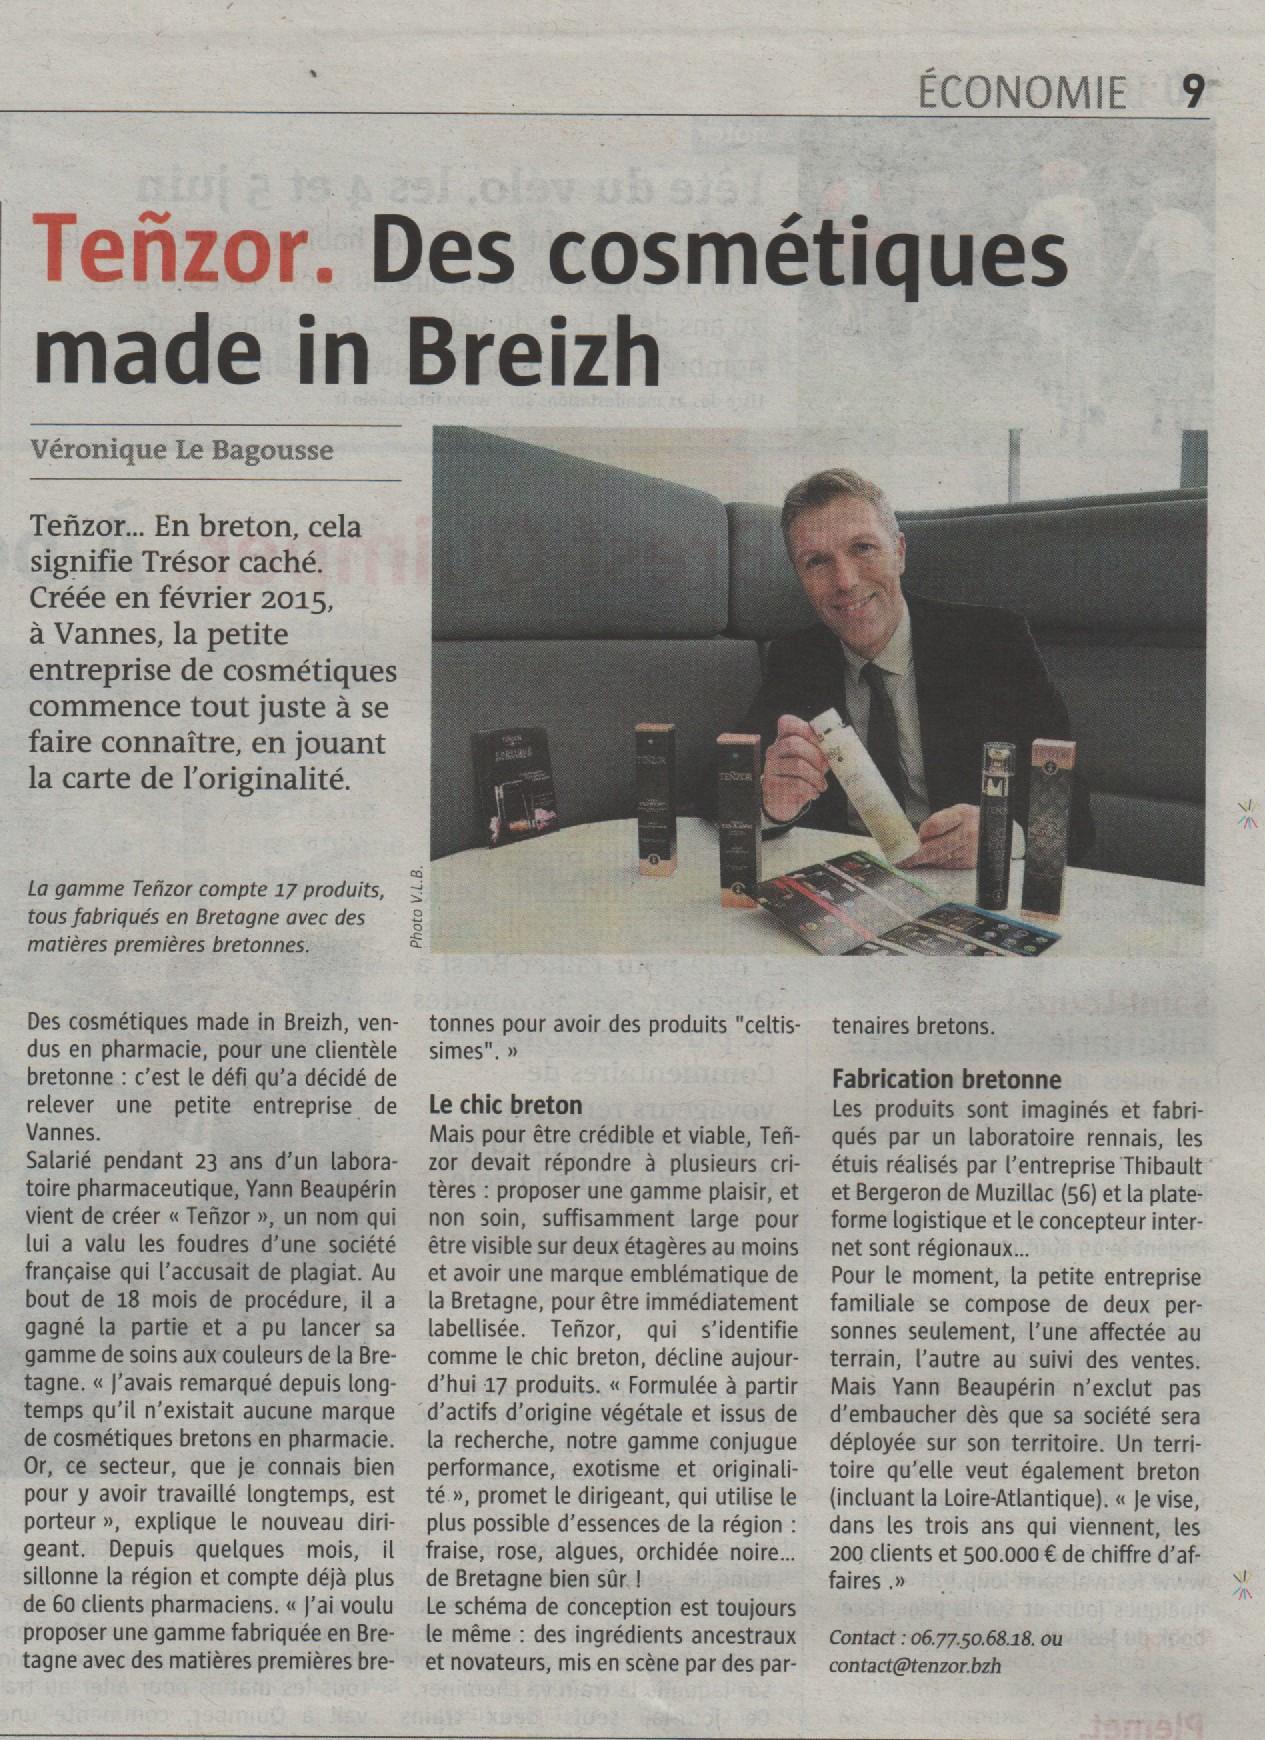 Teñzor. Des cosmétiques made in Breizh